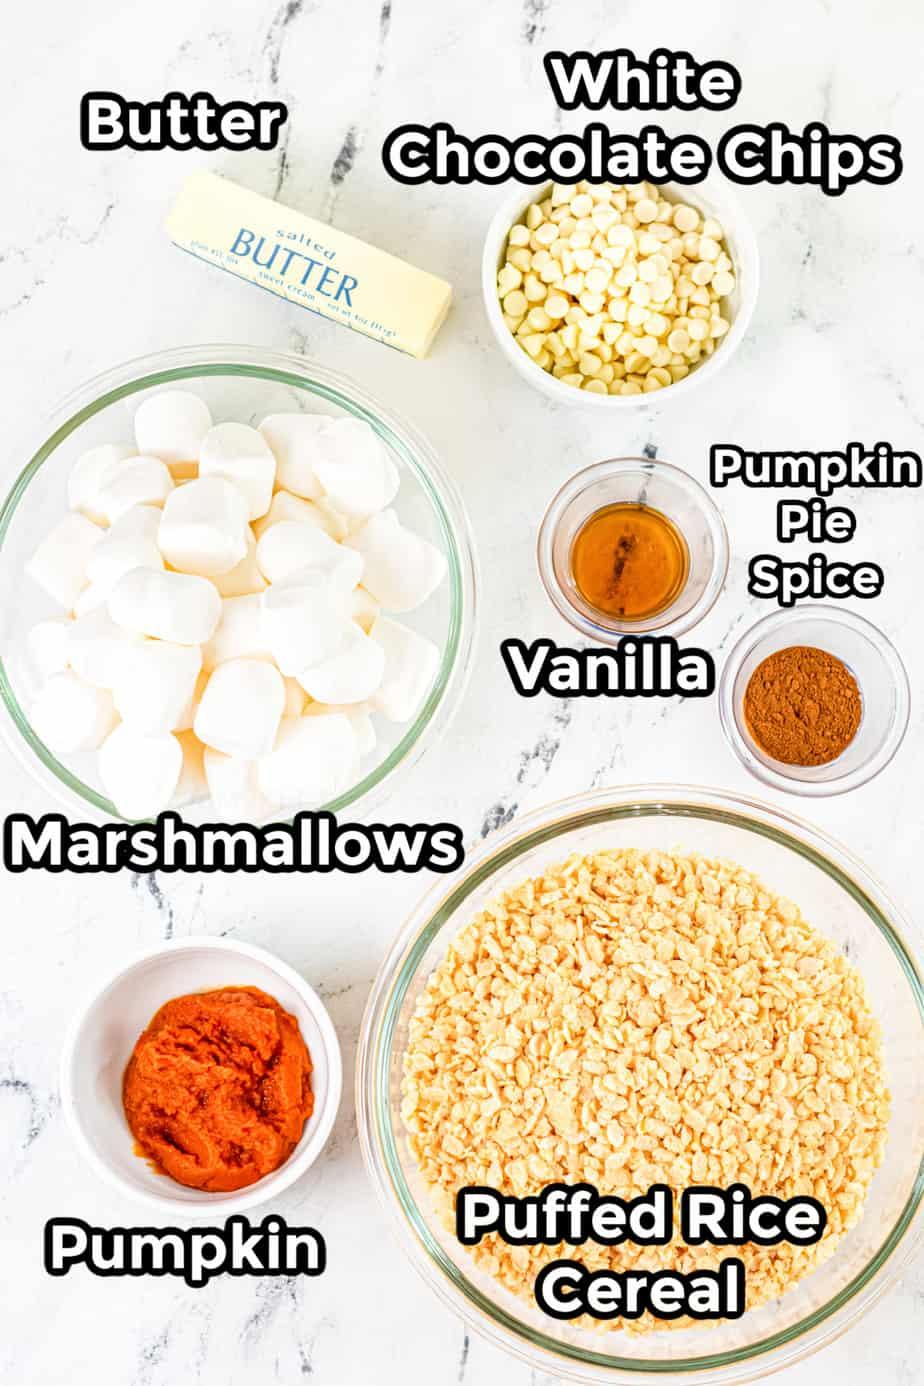 Ingredients for pumpkin spice rice krispie treats